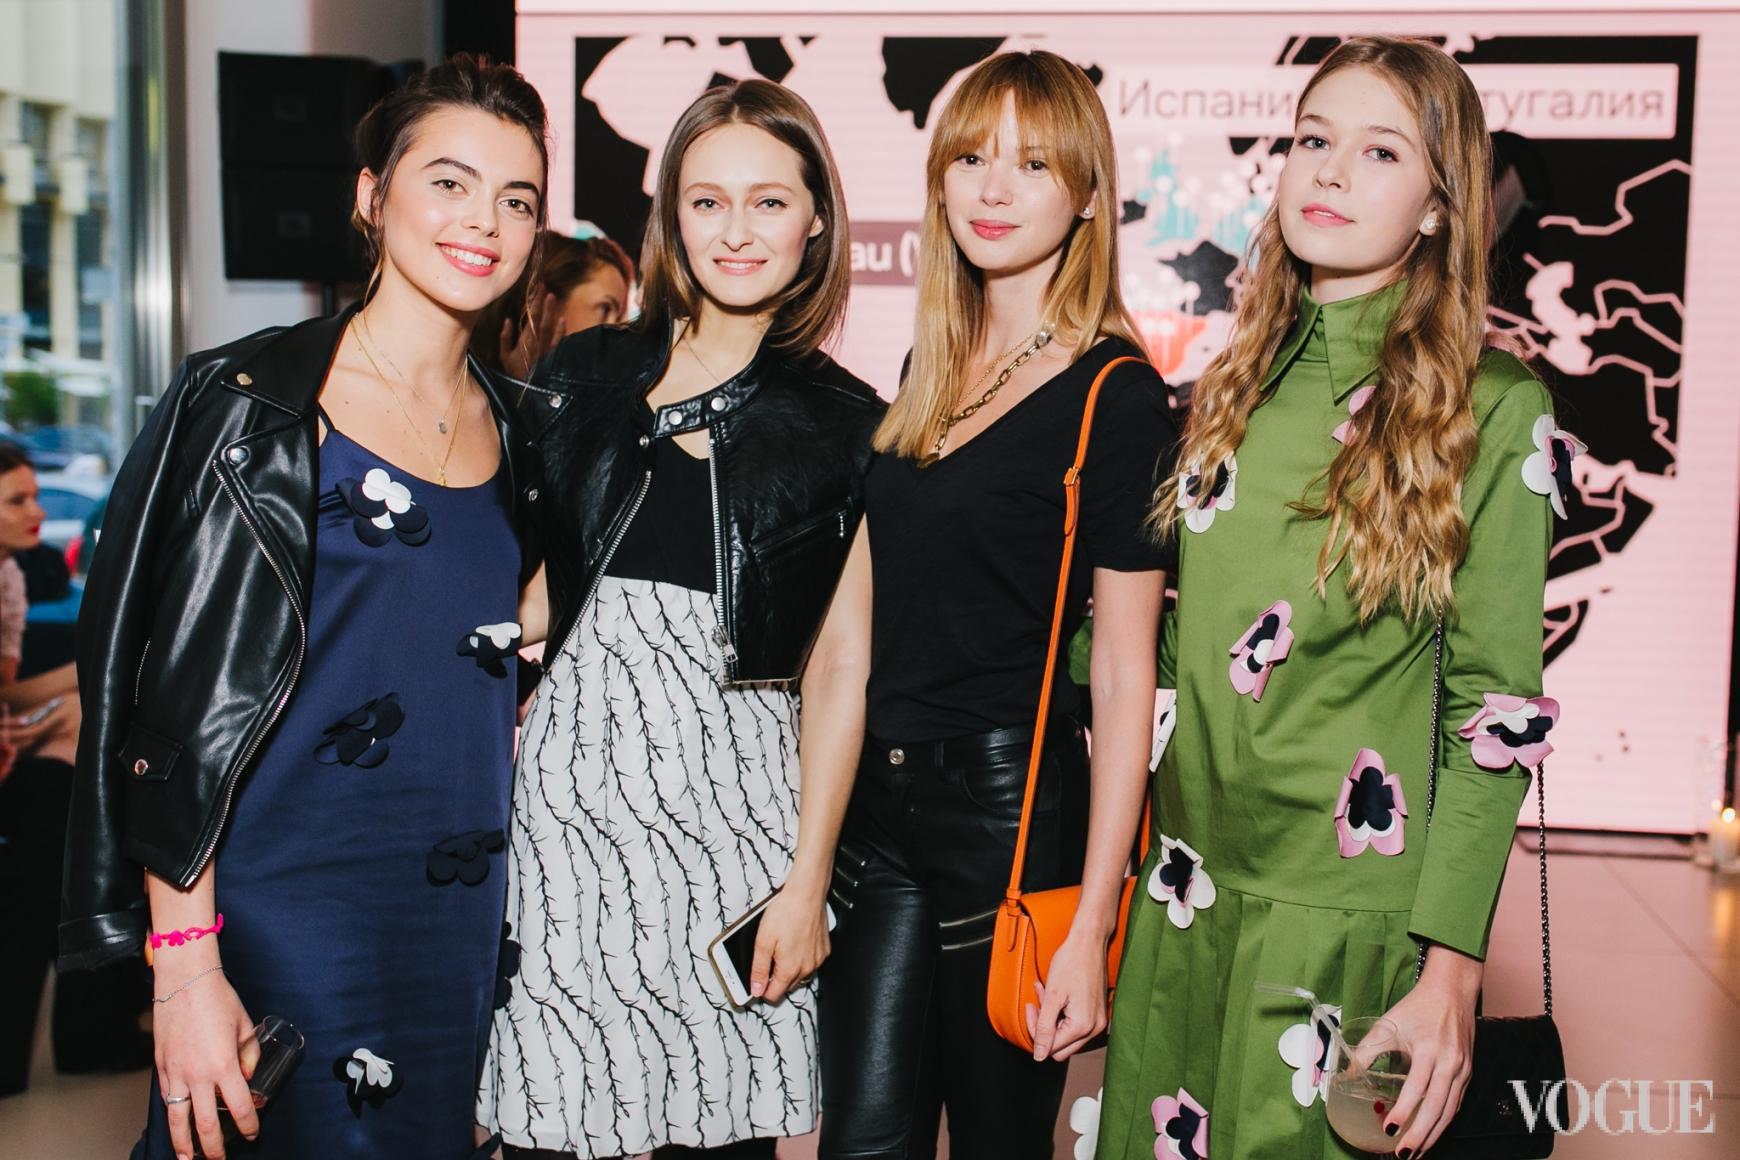 Елизавета Арфуш, Дарья Шаповалова, Алена Масюткина и Соня Киперман